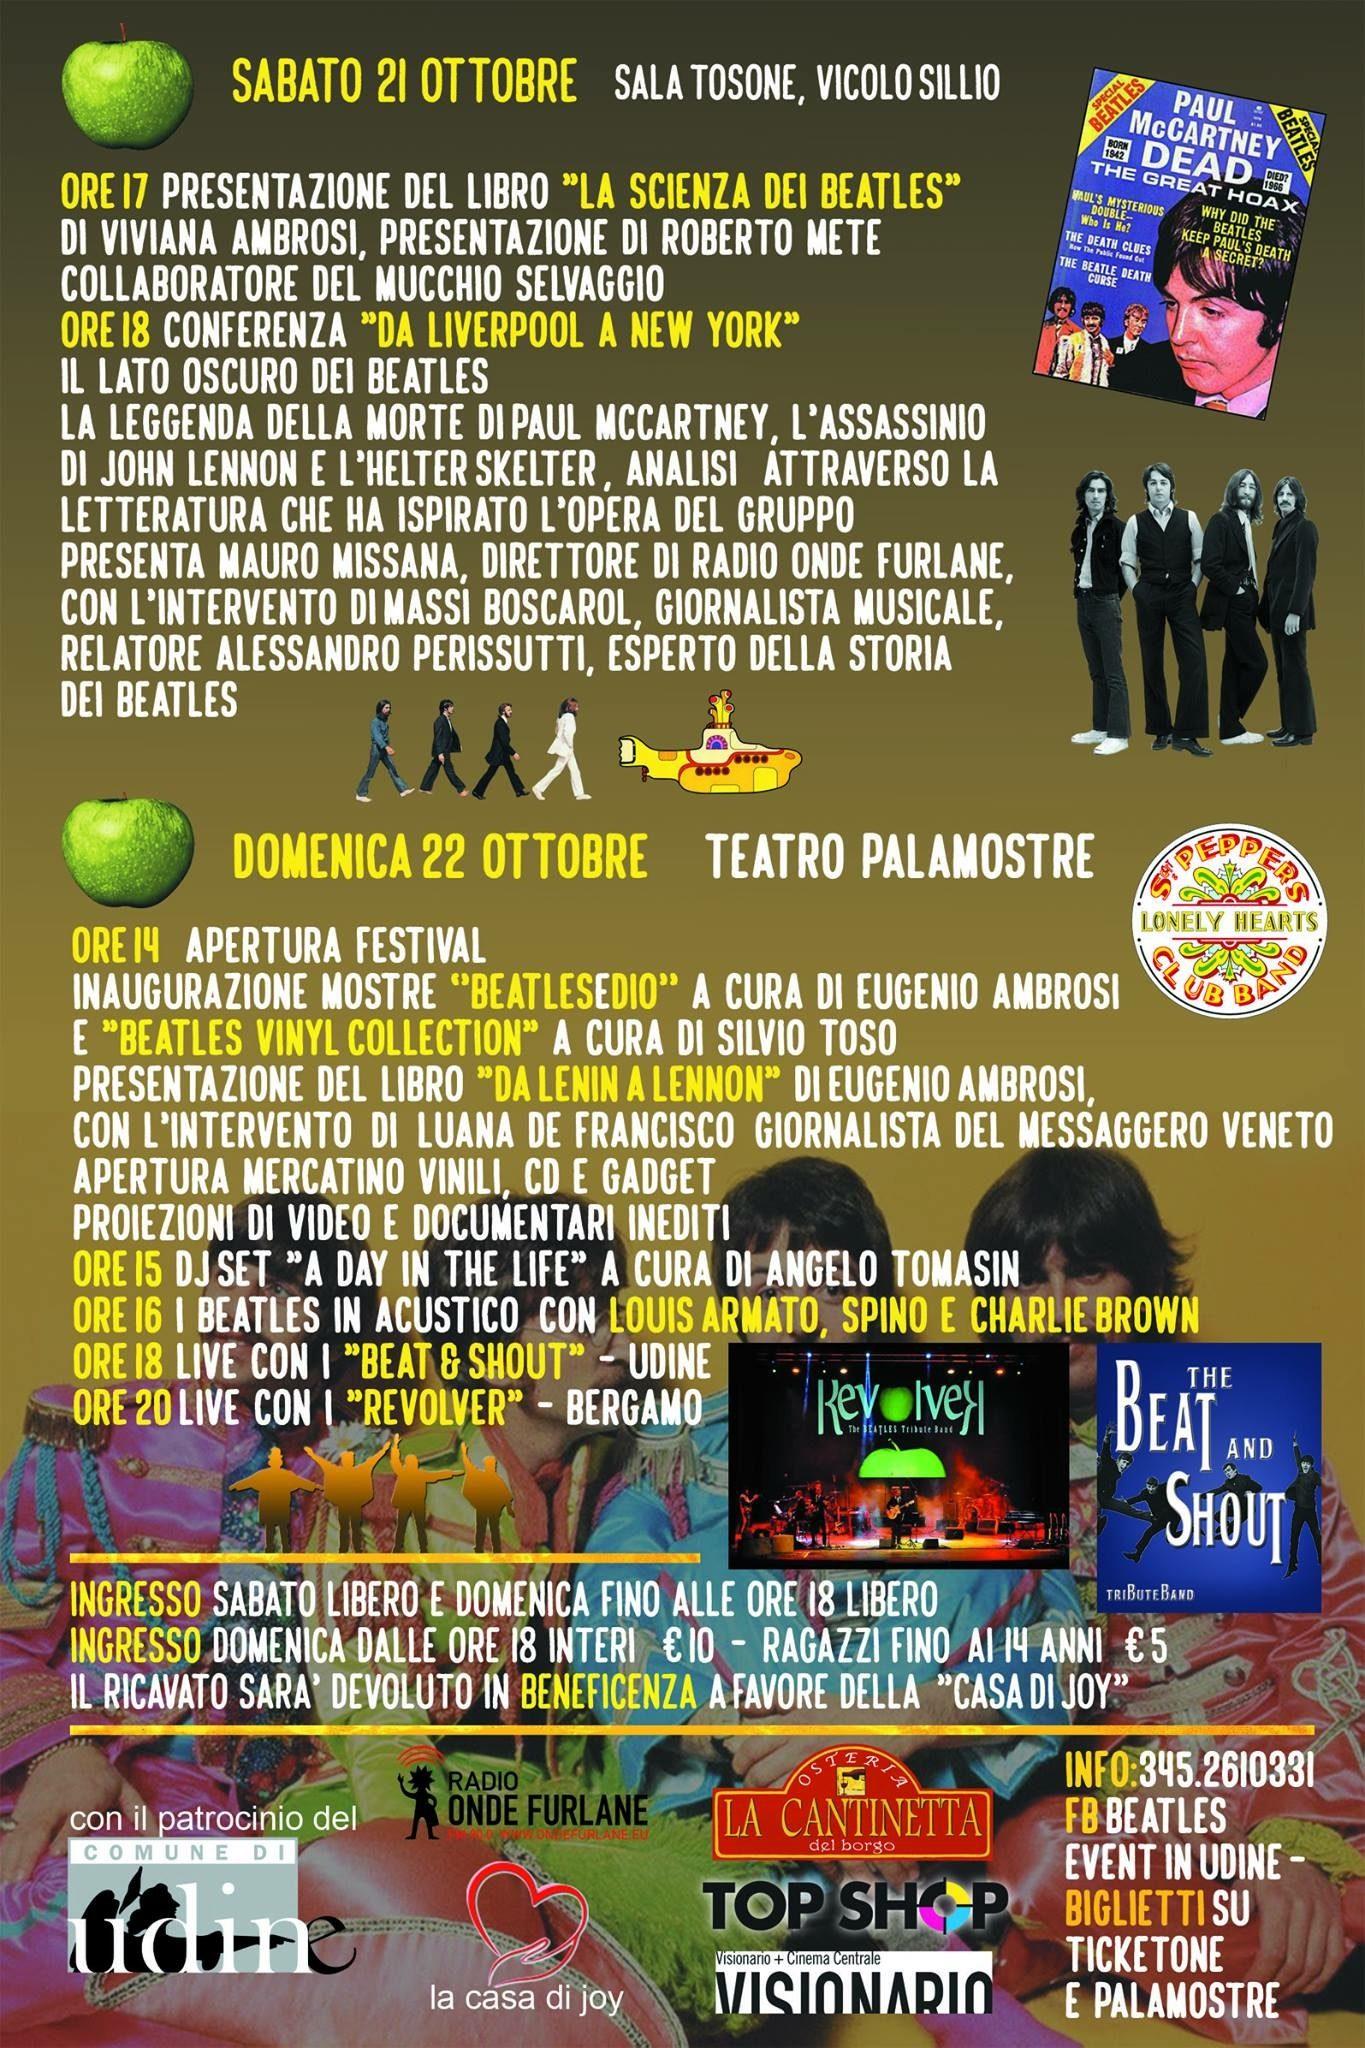 evento friuli image1 22.10.2017   Beatles Udine